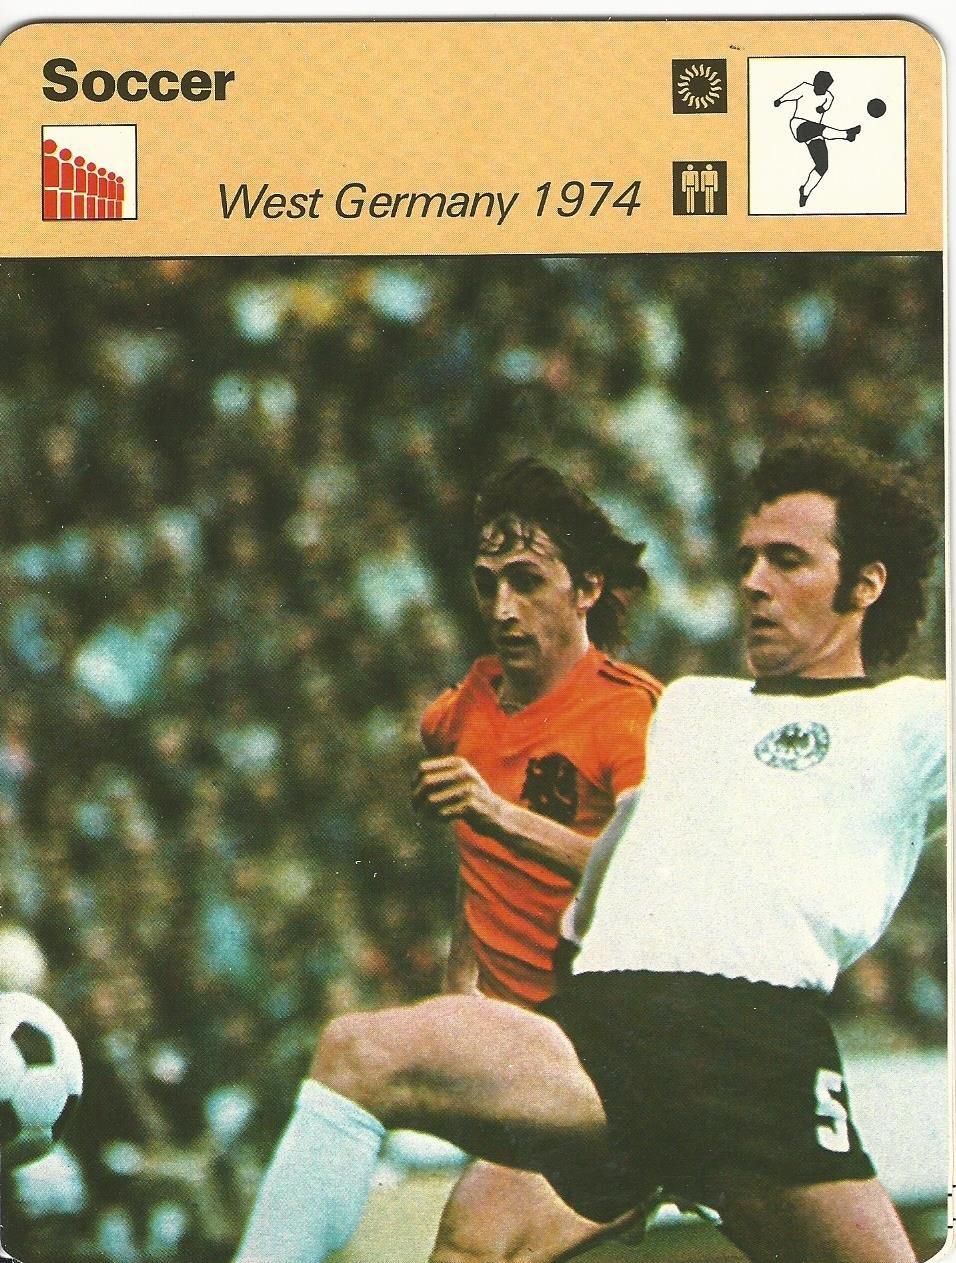 1977-79 Sportscaster Card, 39.16 Soccer, Johann Cruyff, Germany